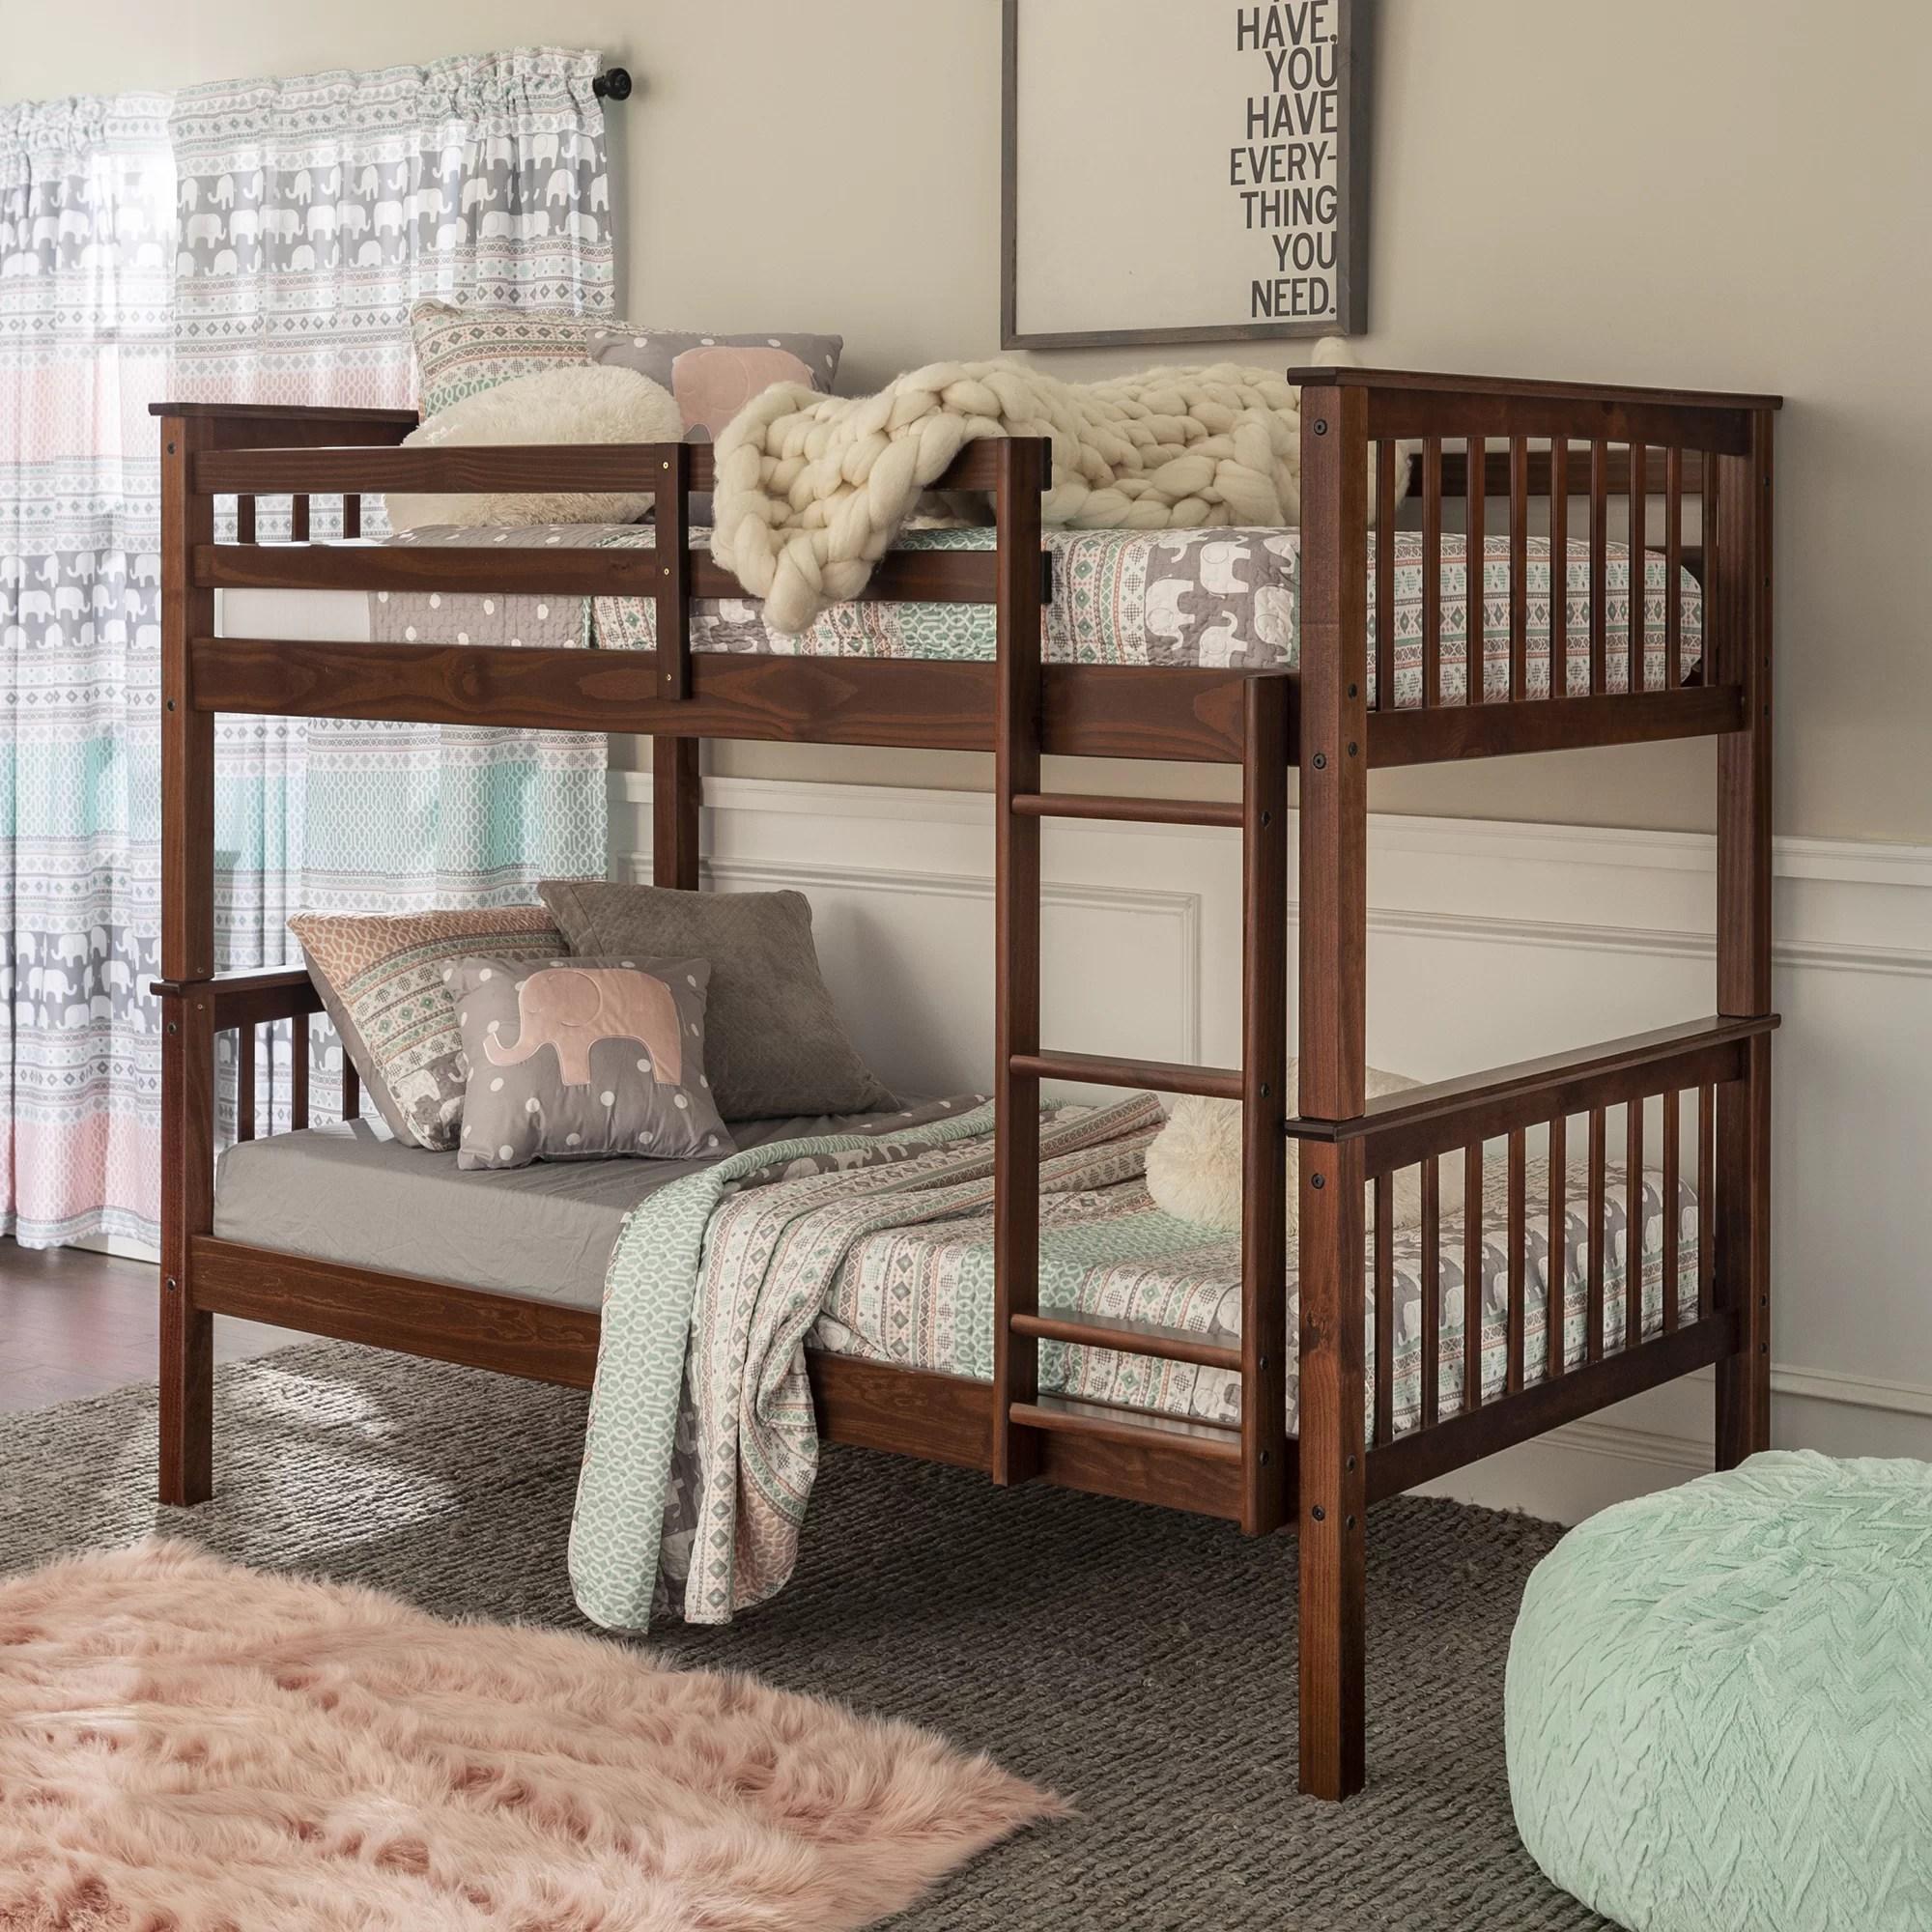 teen bunk loft beds you ll love in